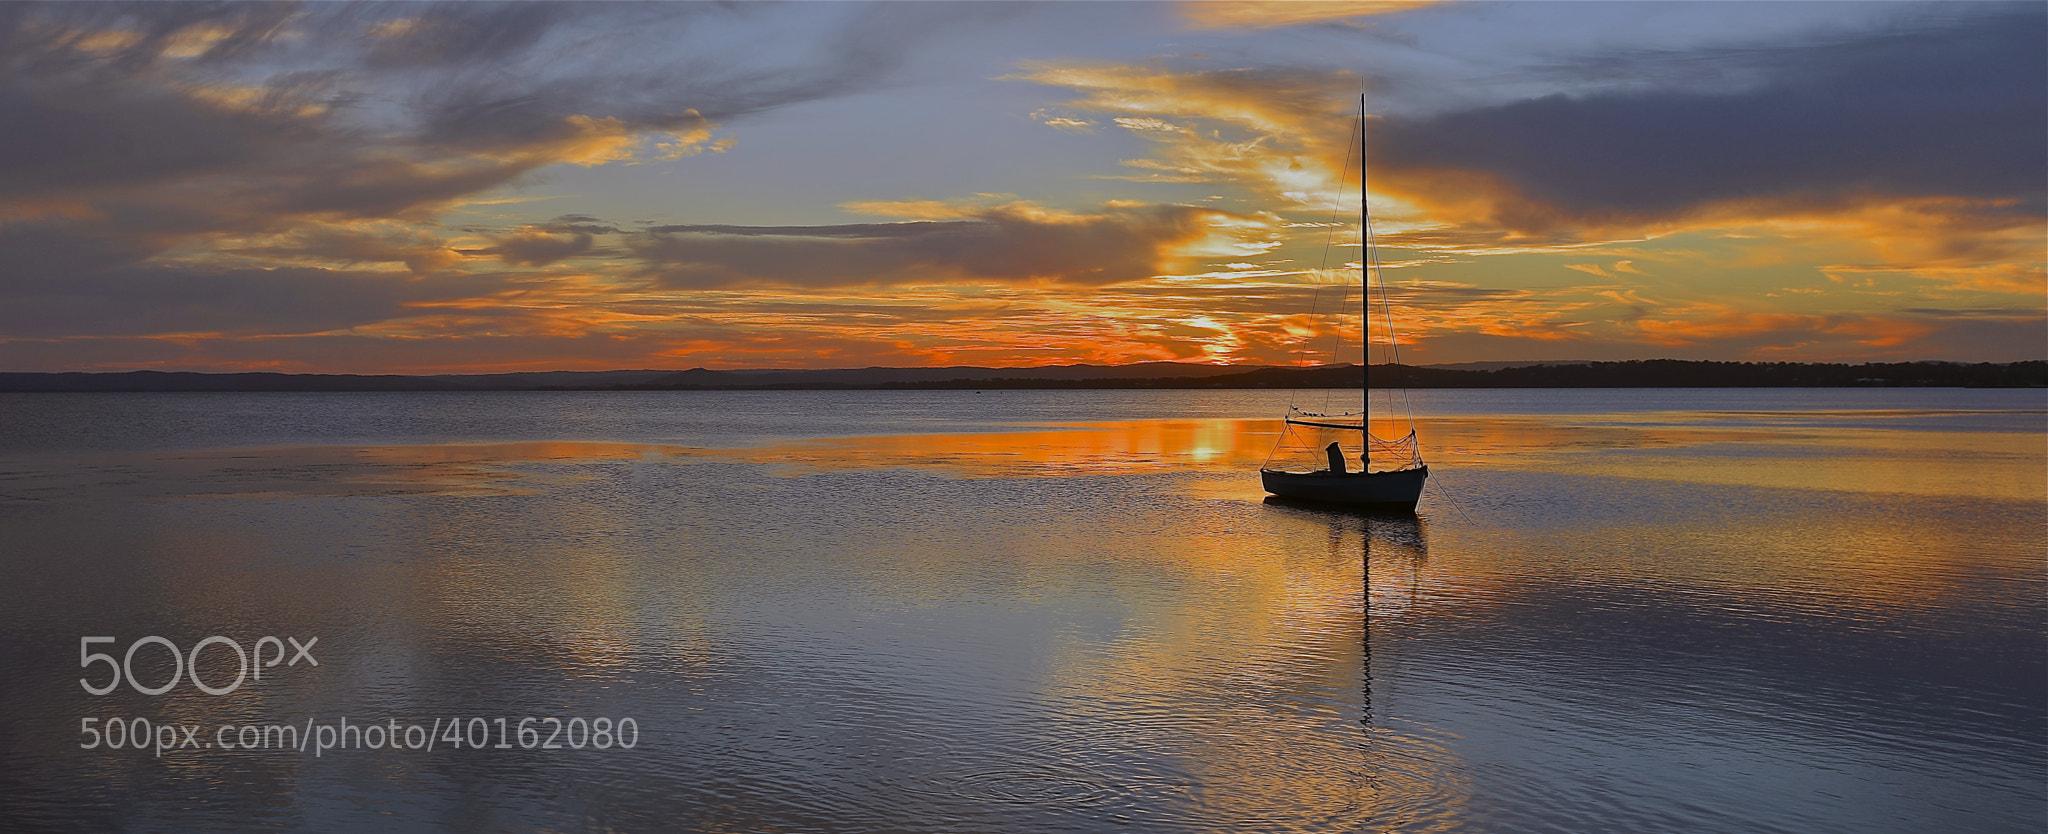 Photograph Peaceful Sunset. by Warren Patten on 500px